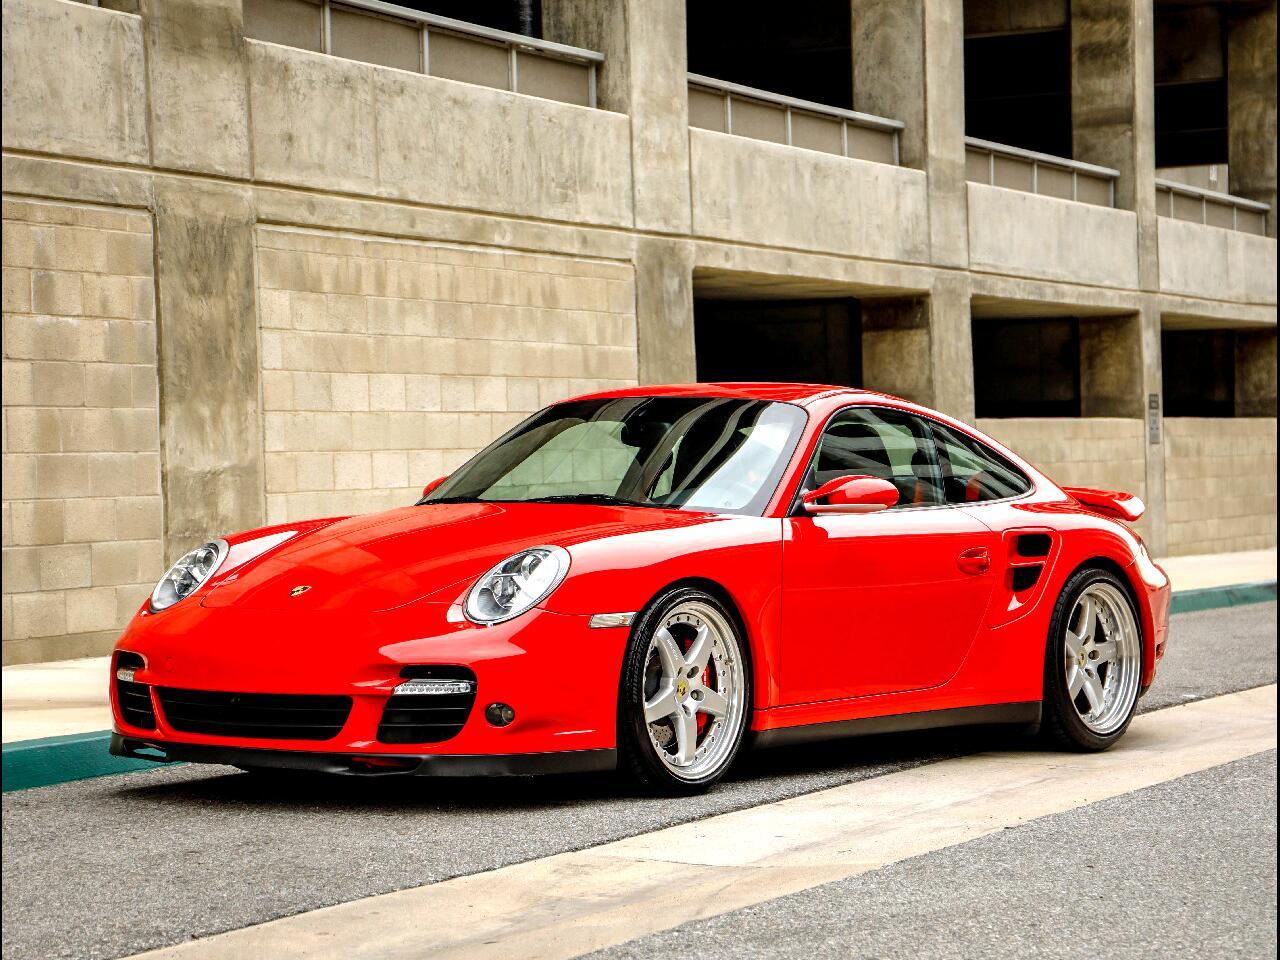 2007 Porsche 911 Turbo 6 Speed Coupe